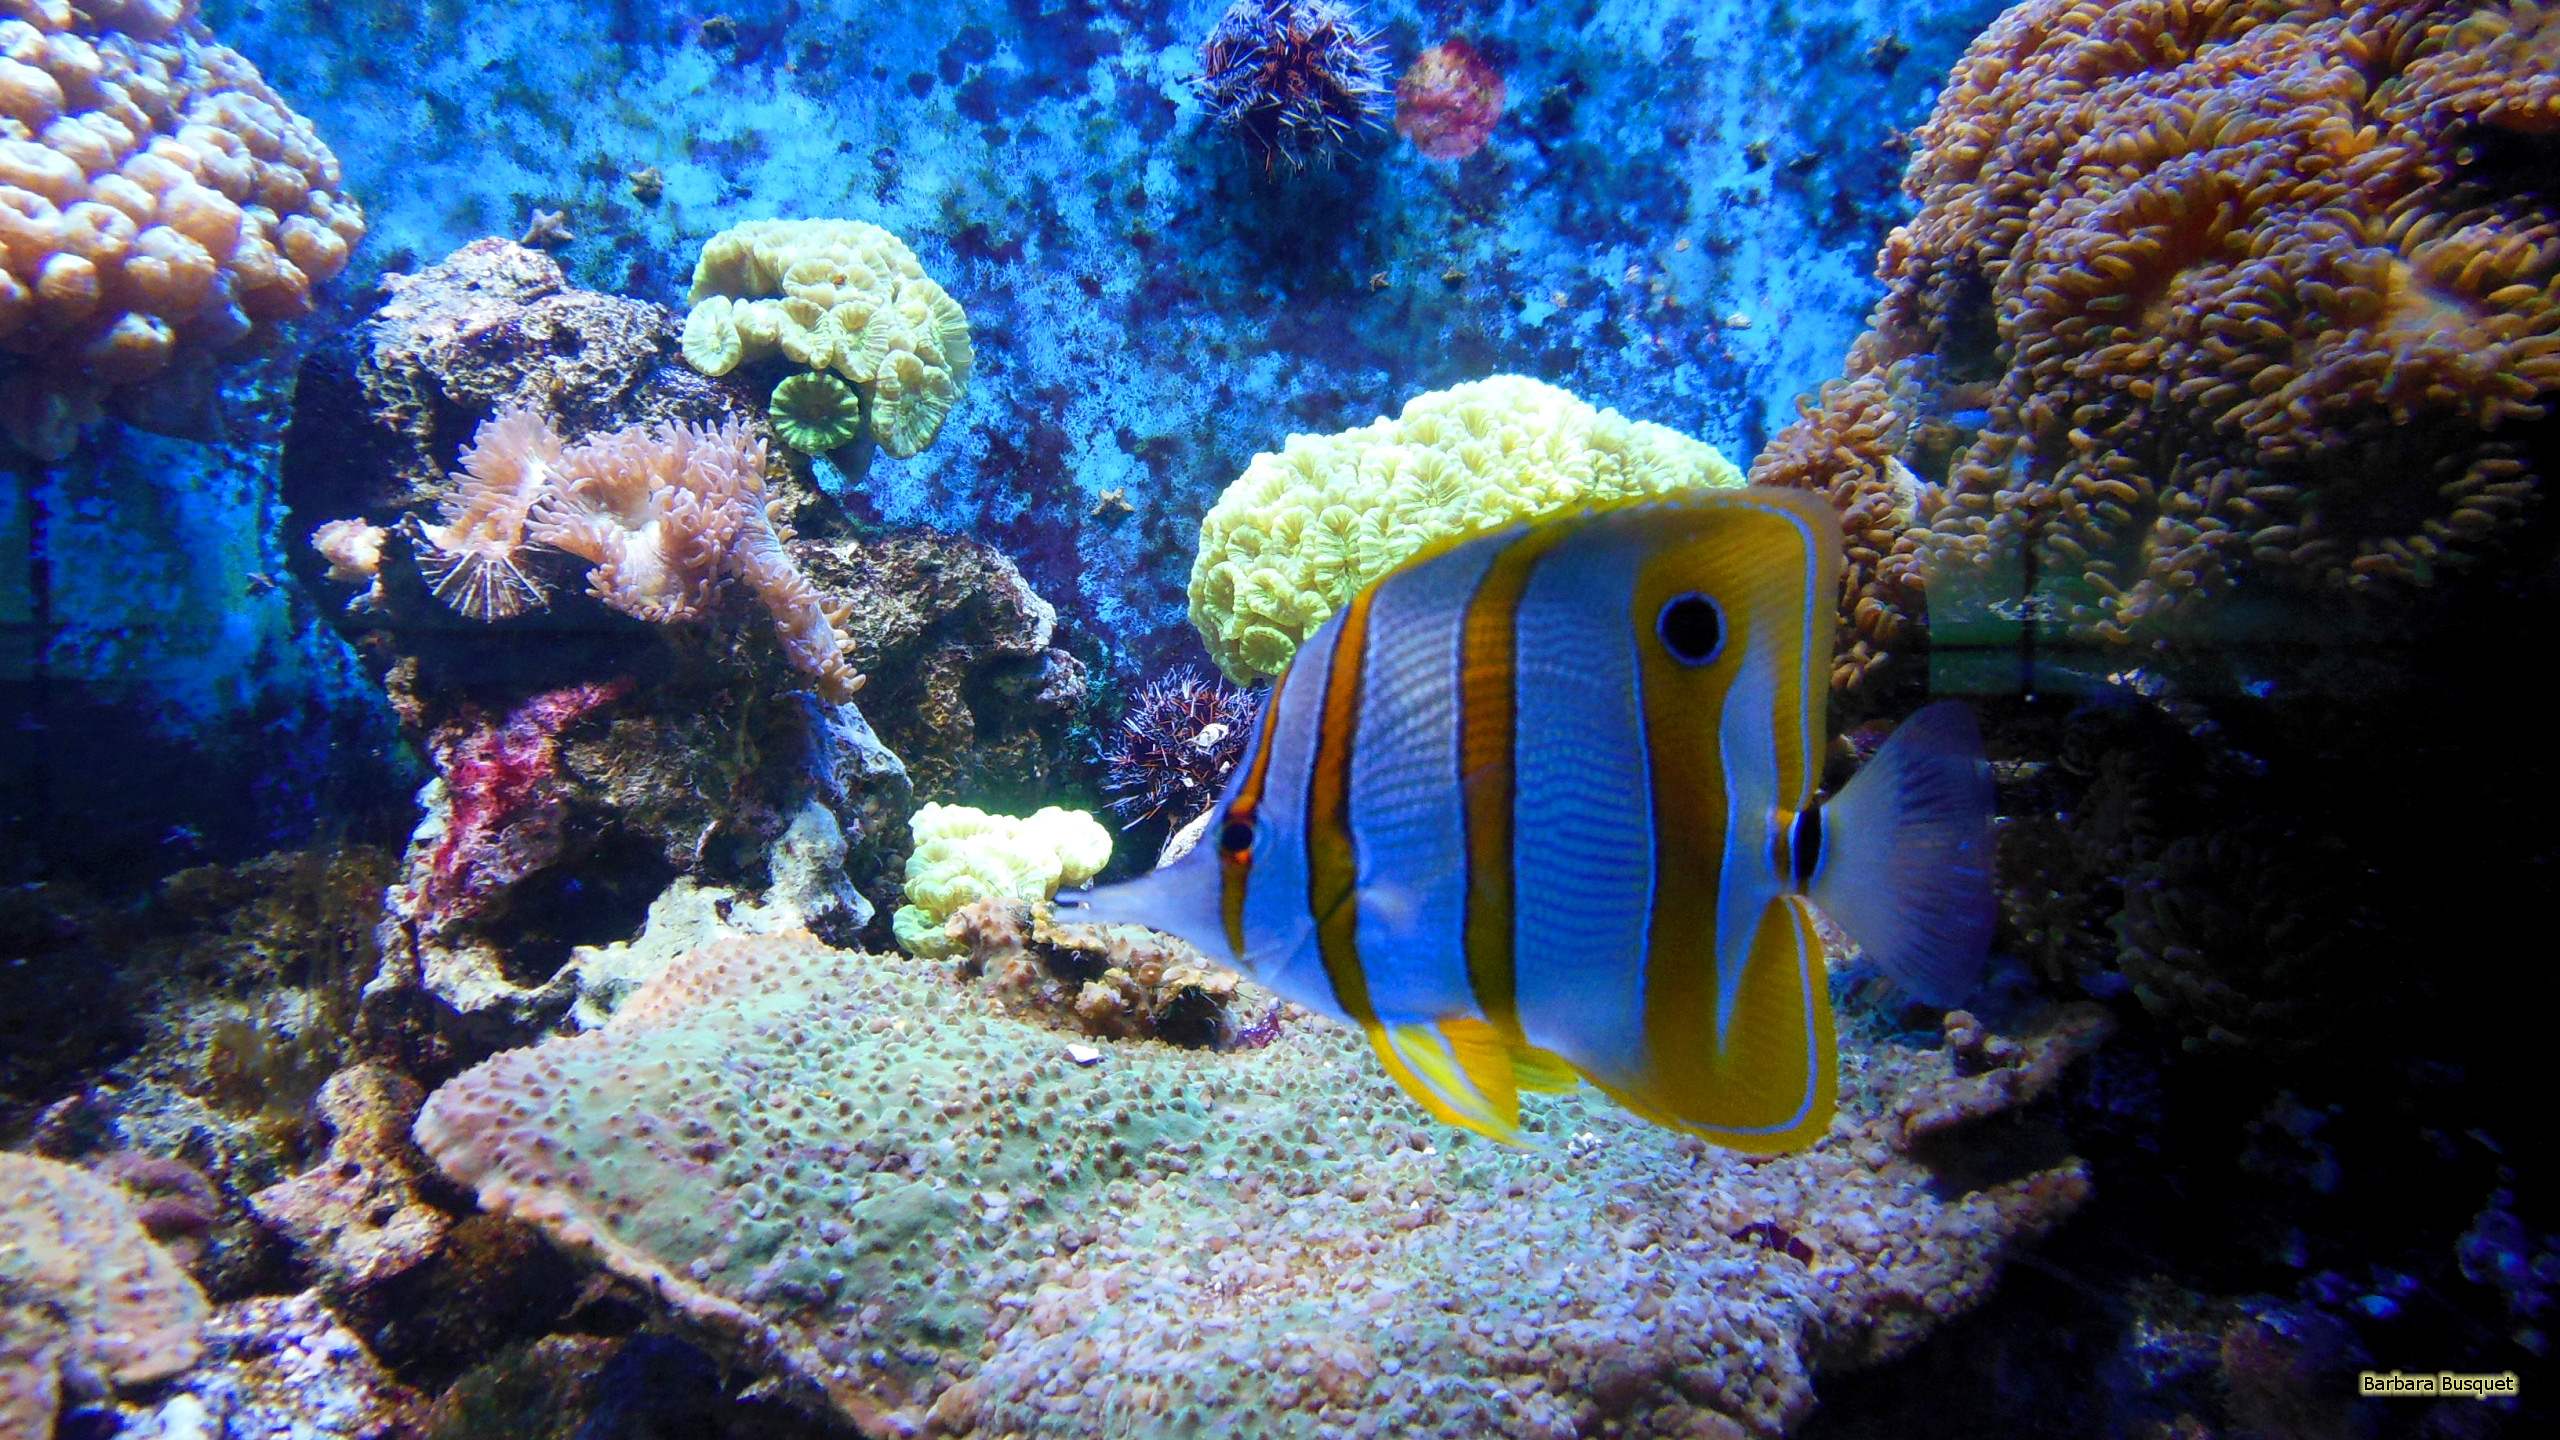 HD Wallpaper Tropical Fish In Aquarium